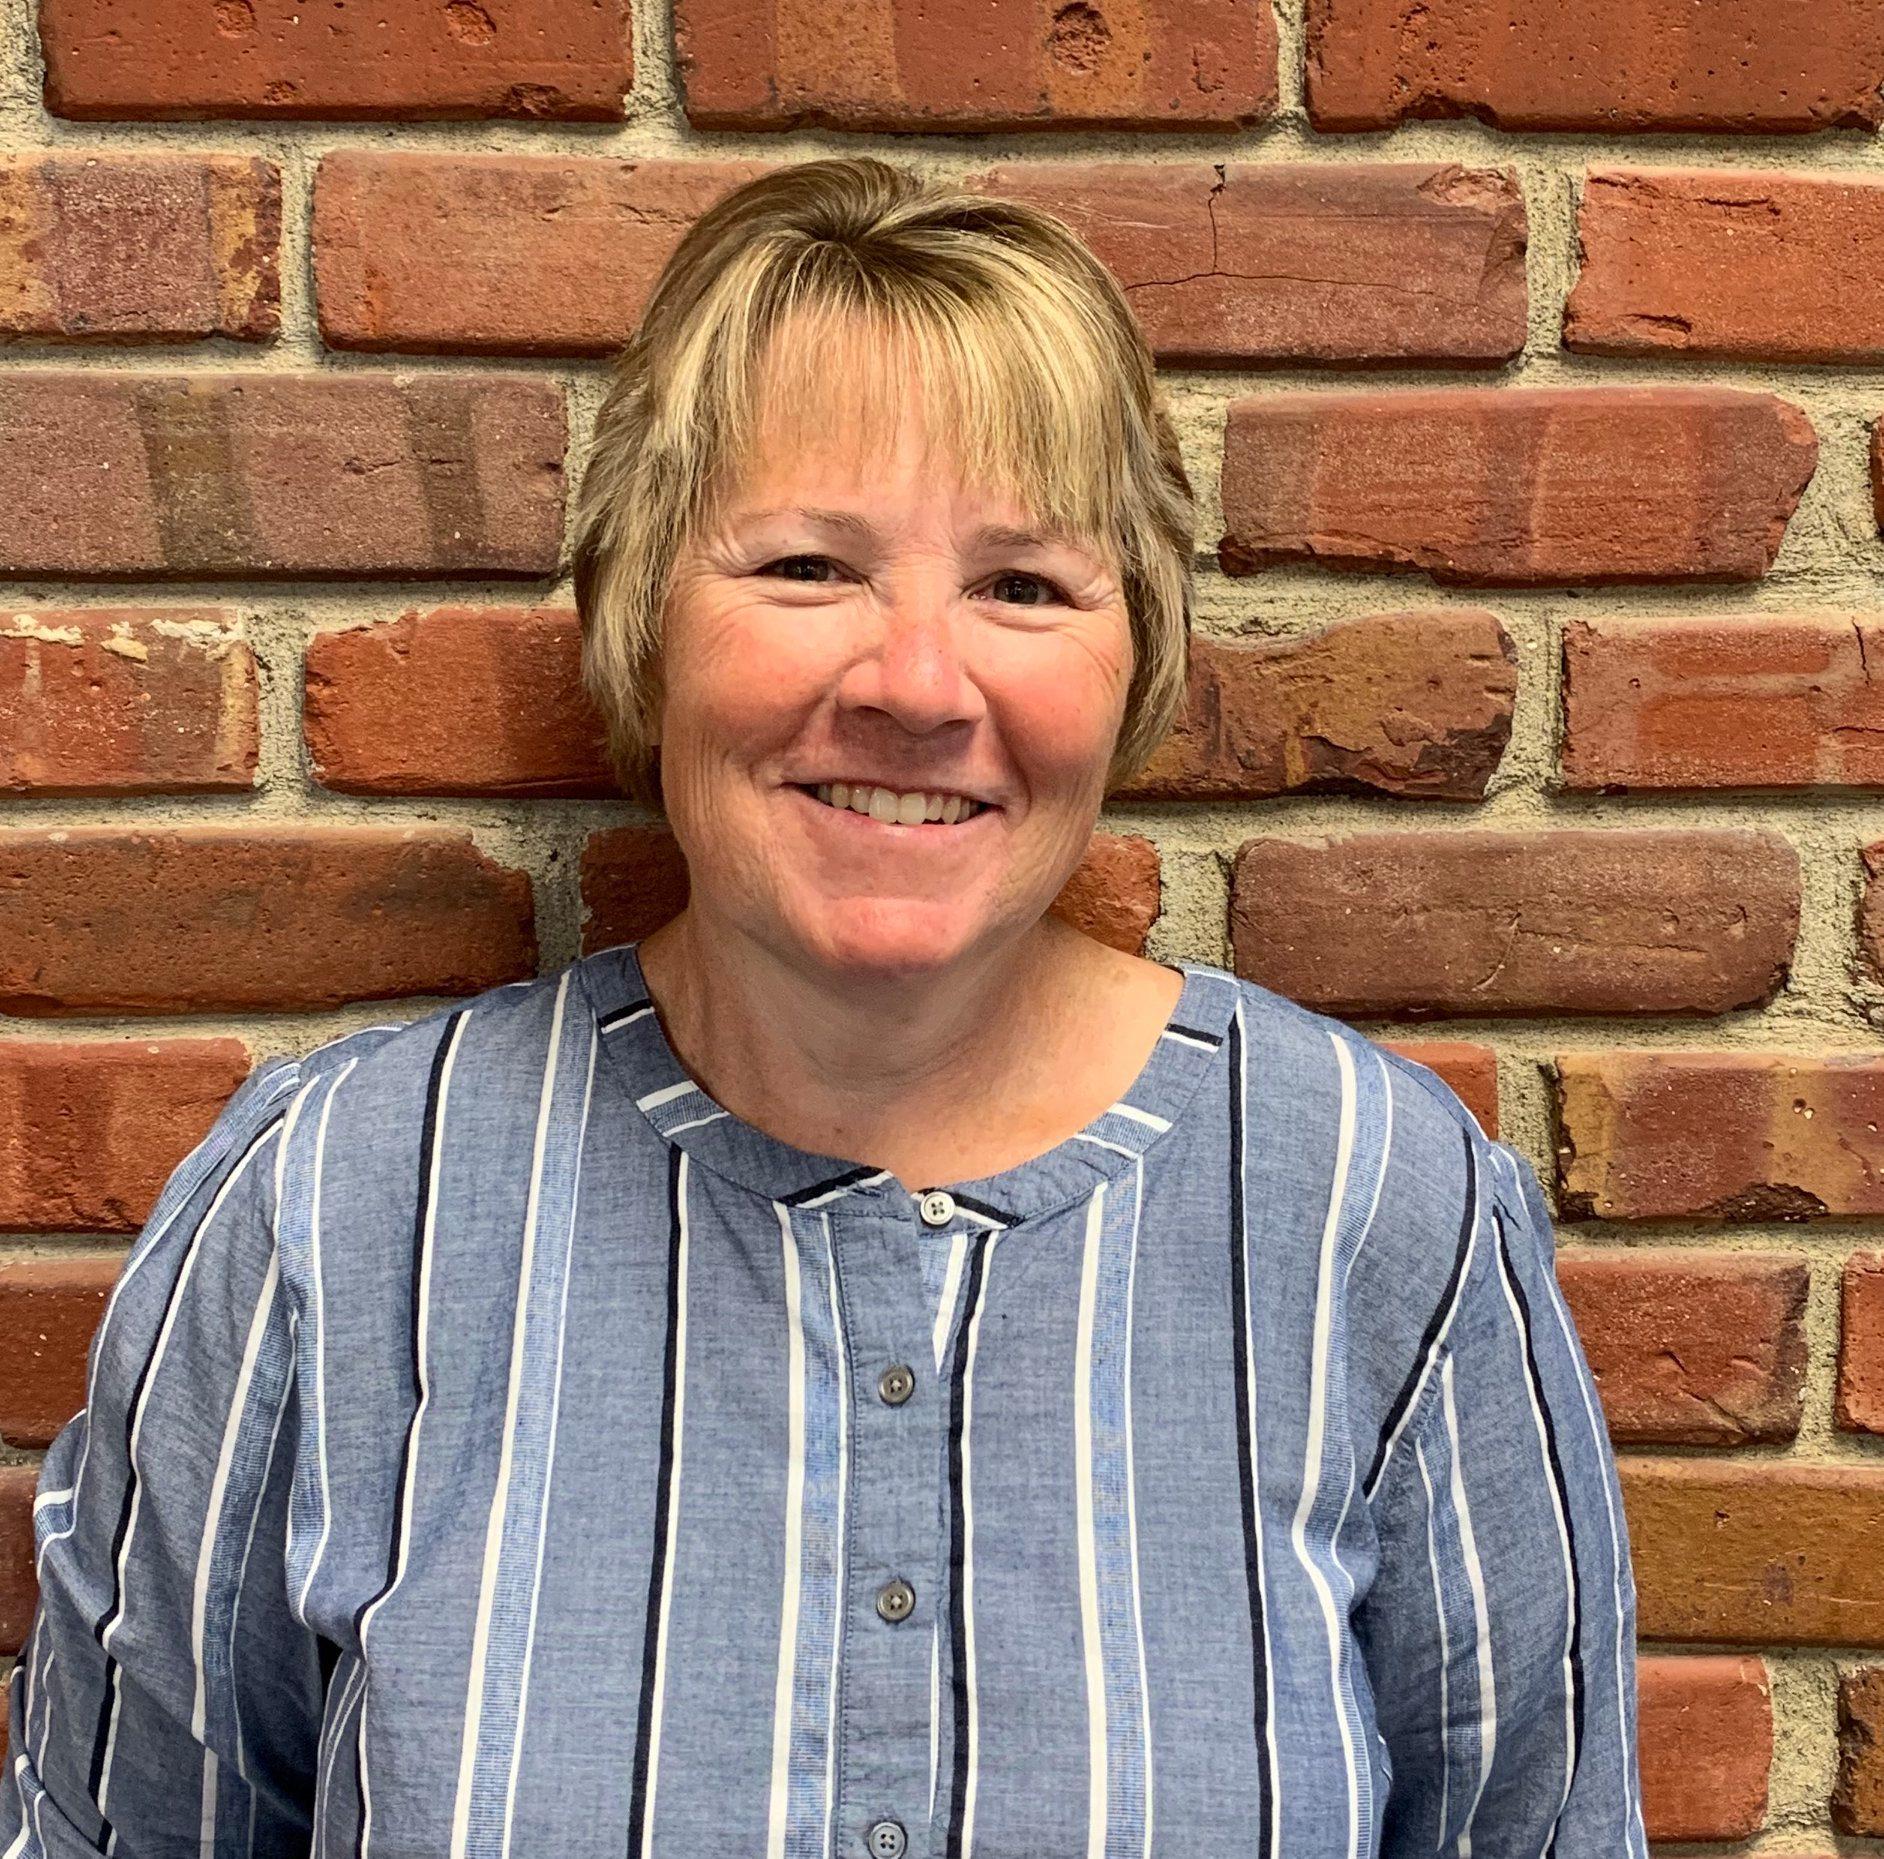 Sharon Plum